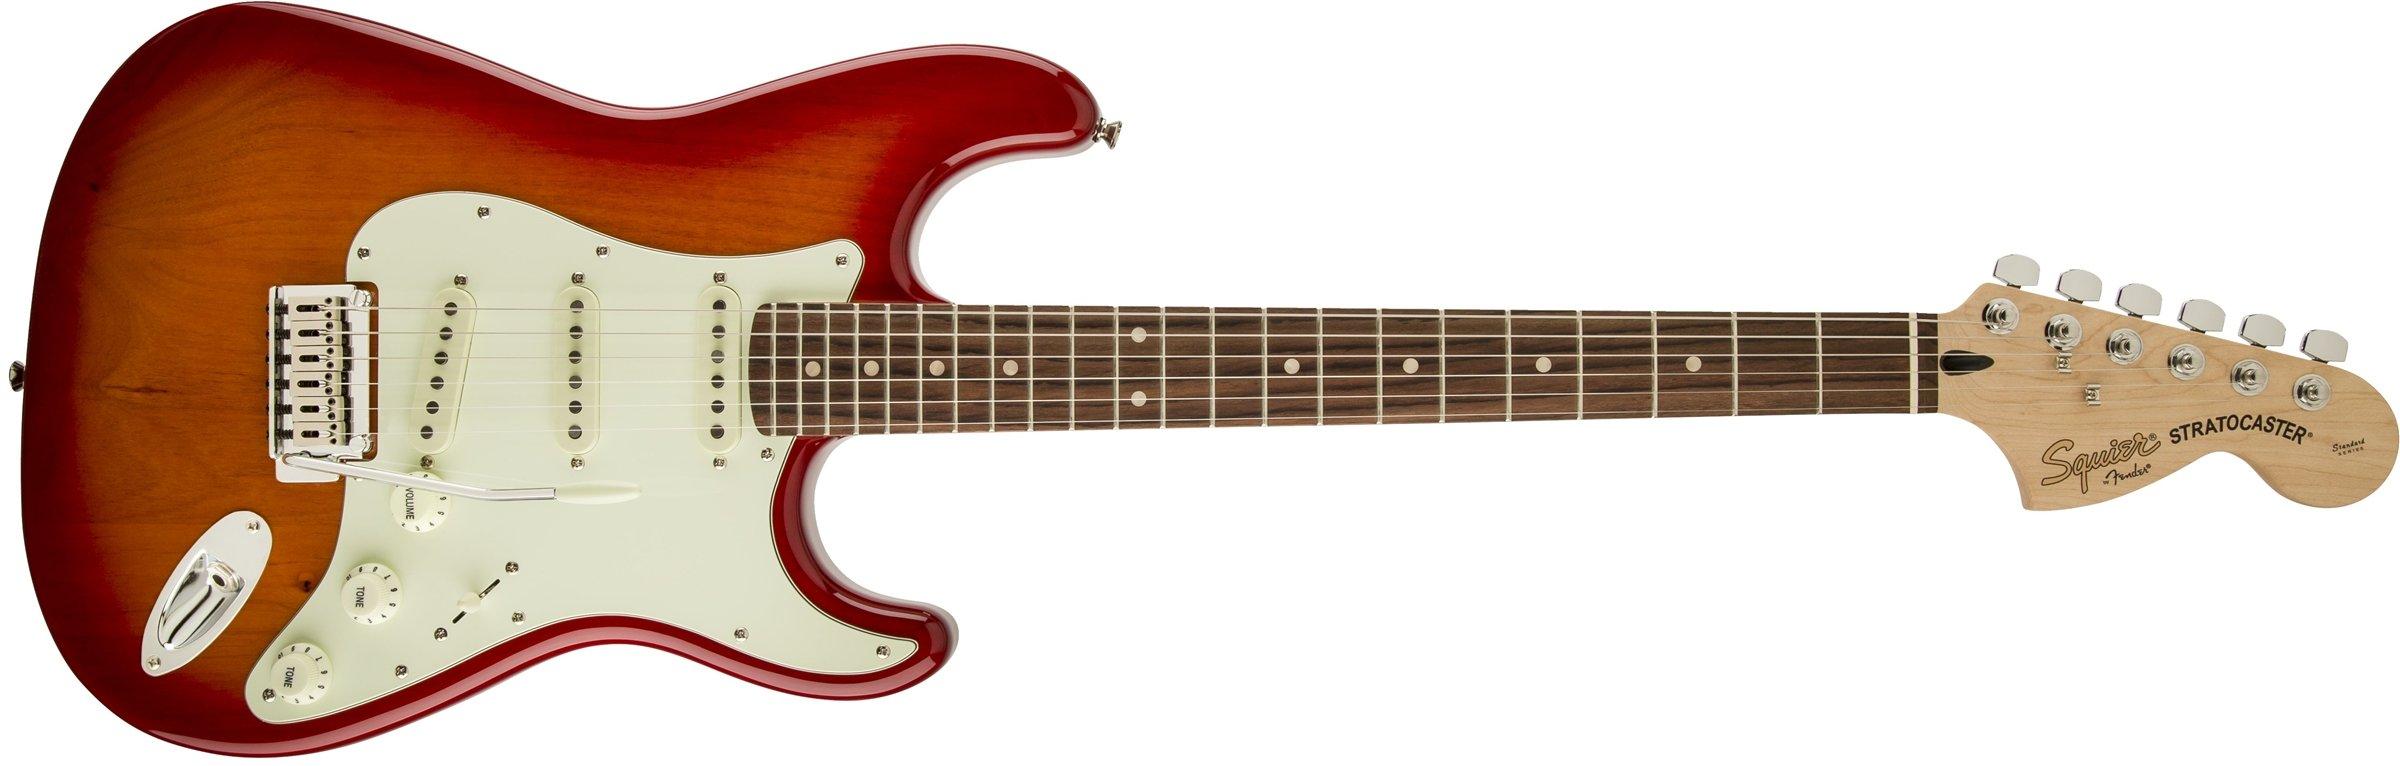 Squier by Fender 321603530 Standard Stratocaster Electric Guitar LTD - Cherry Sunburst - Rosewood Fingerboard